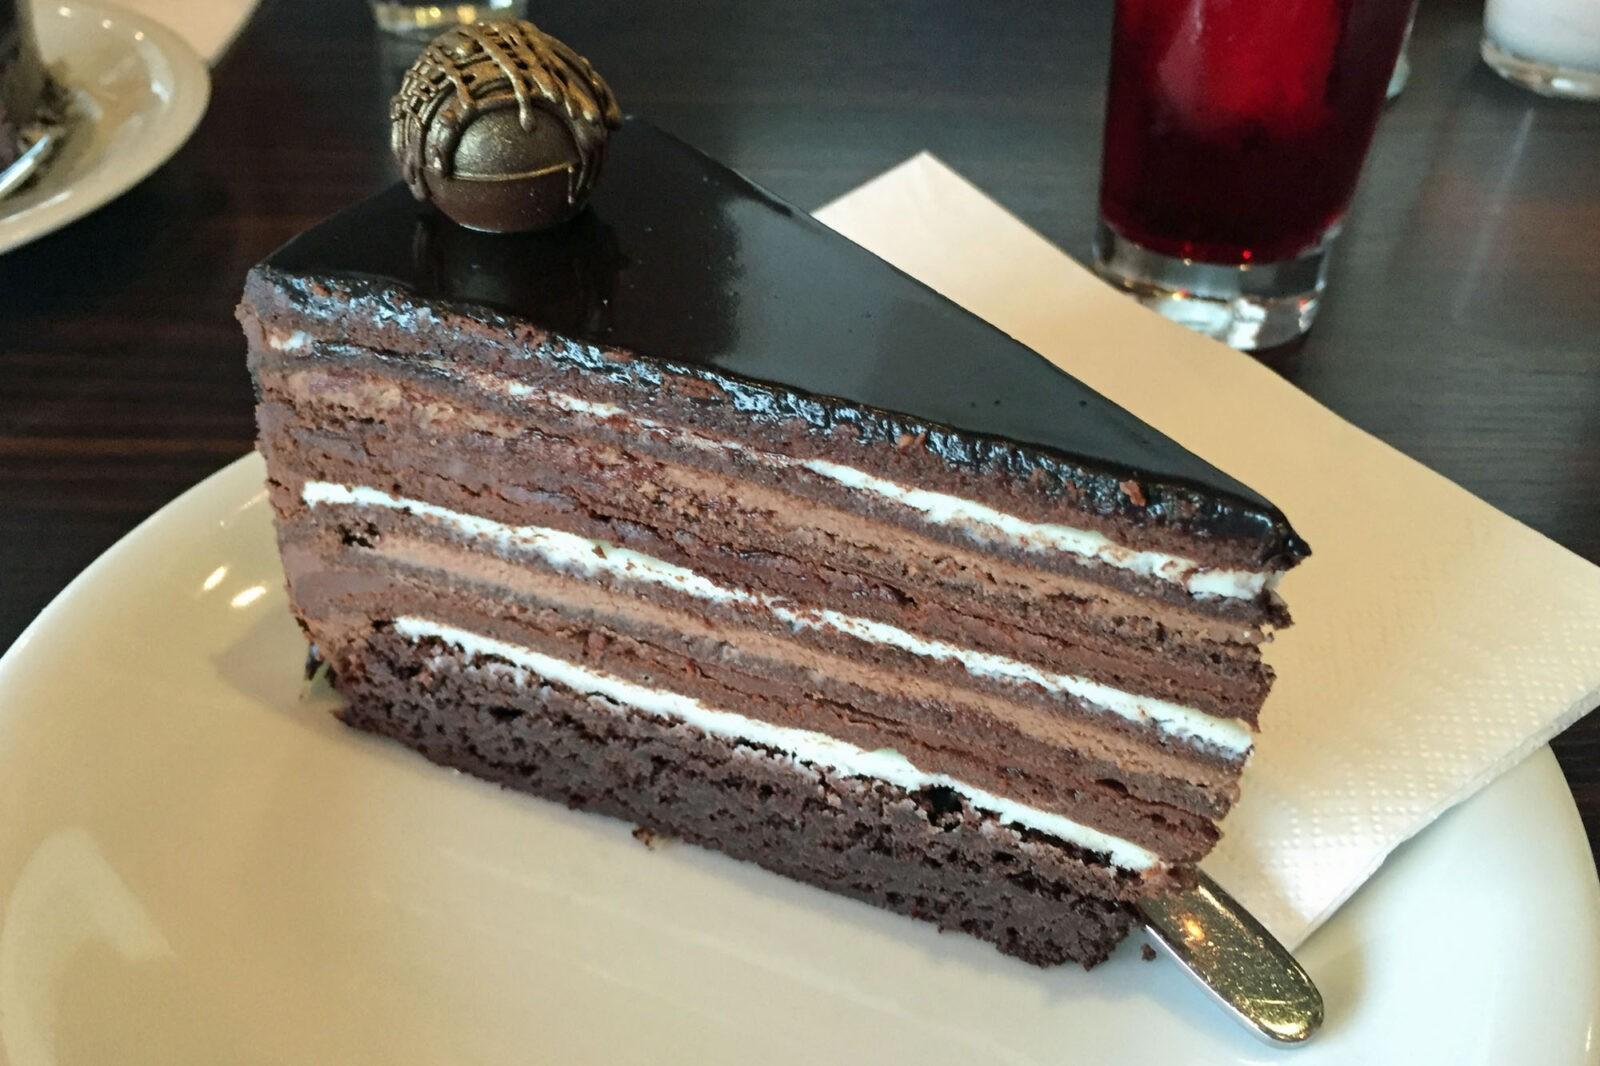 lecker essen in k ln dreik nigstorte im chocolat grand caf op j ck. Black Bedroom Furniture Sets. Home Design Ideas